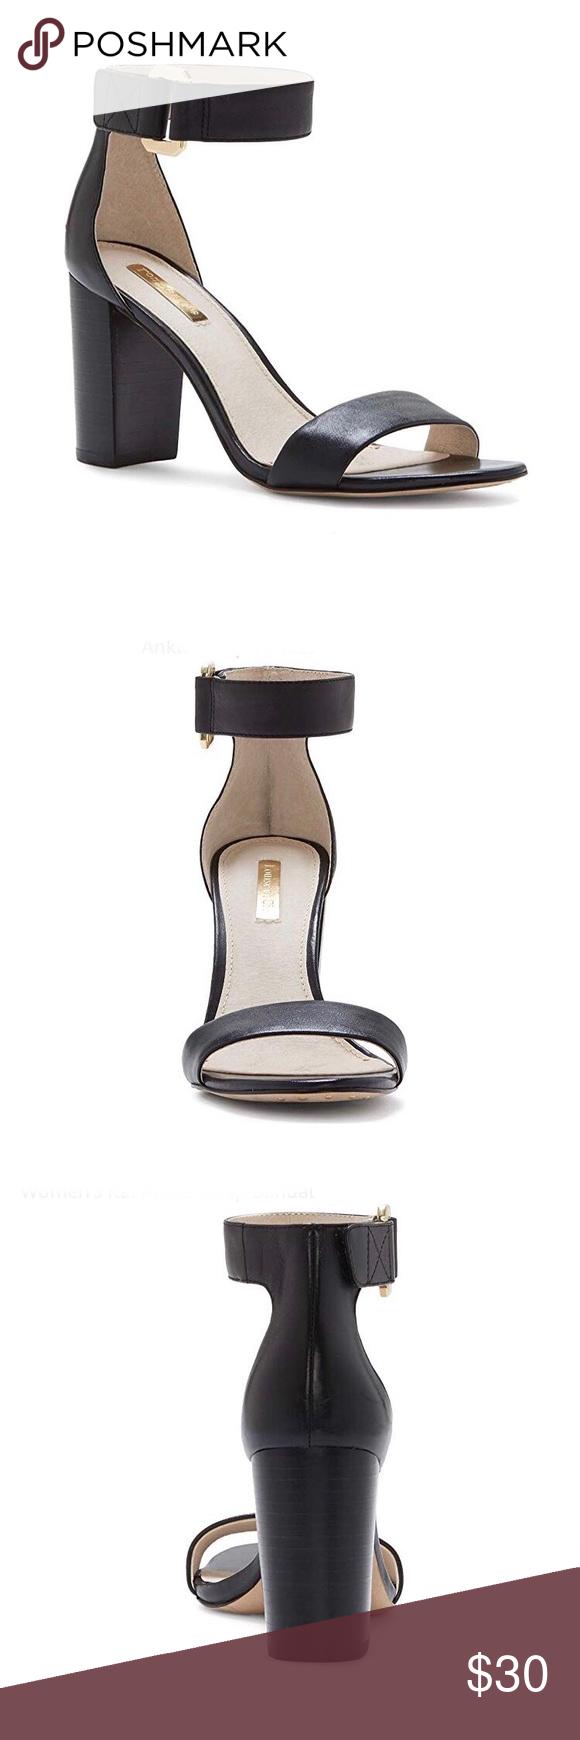 23c0adef92942 Louise et Cie Women's Kai Ankle Strap Sandal The Louise et Cie™ Kai ...